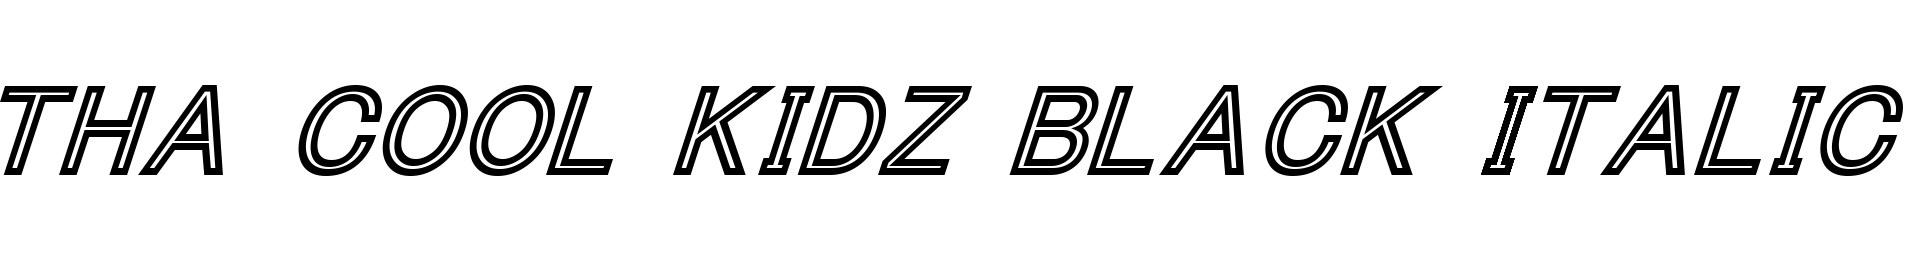 Tha Cool Kidz Black Italic